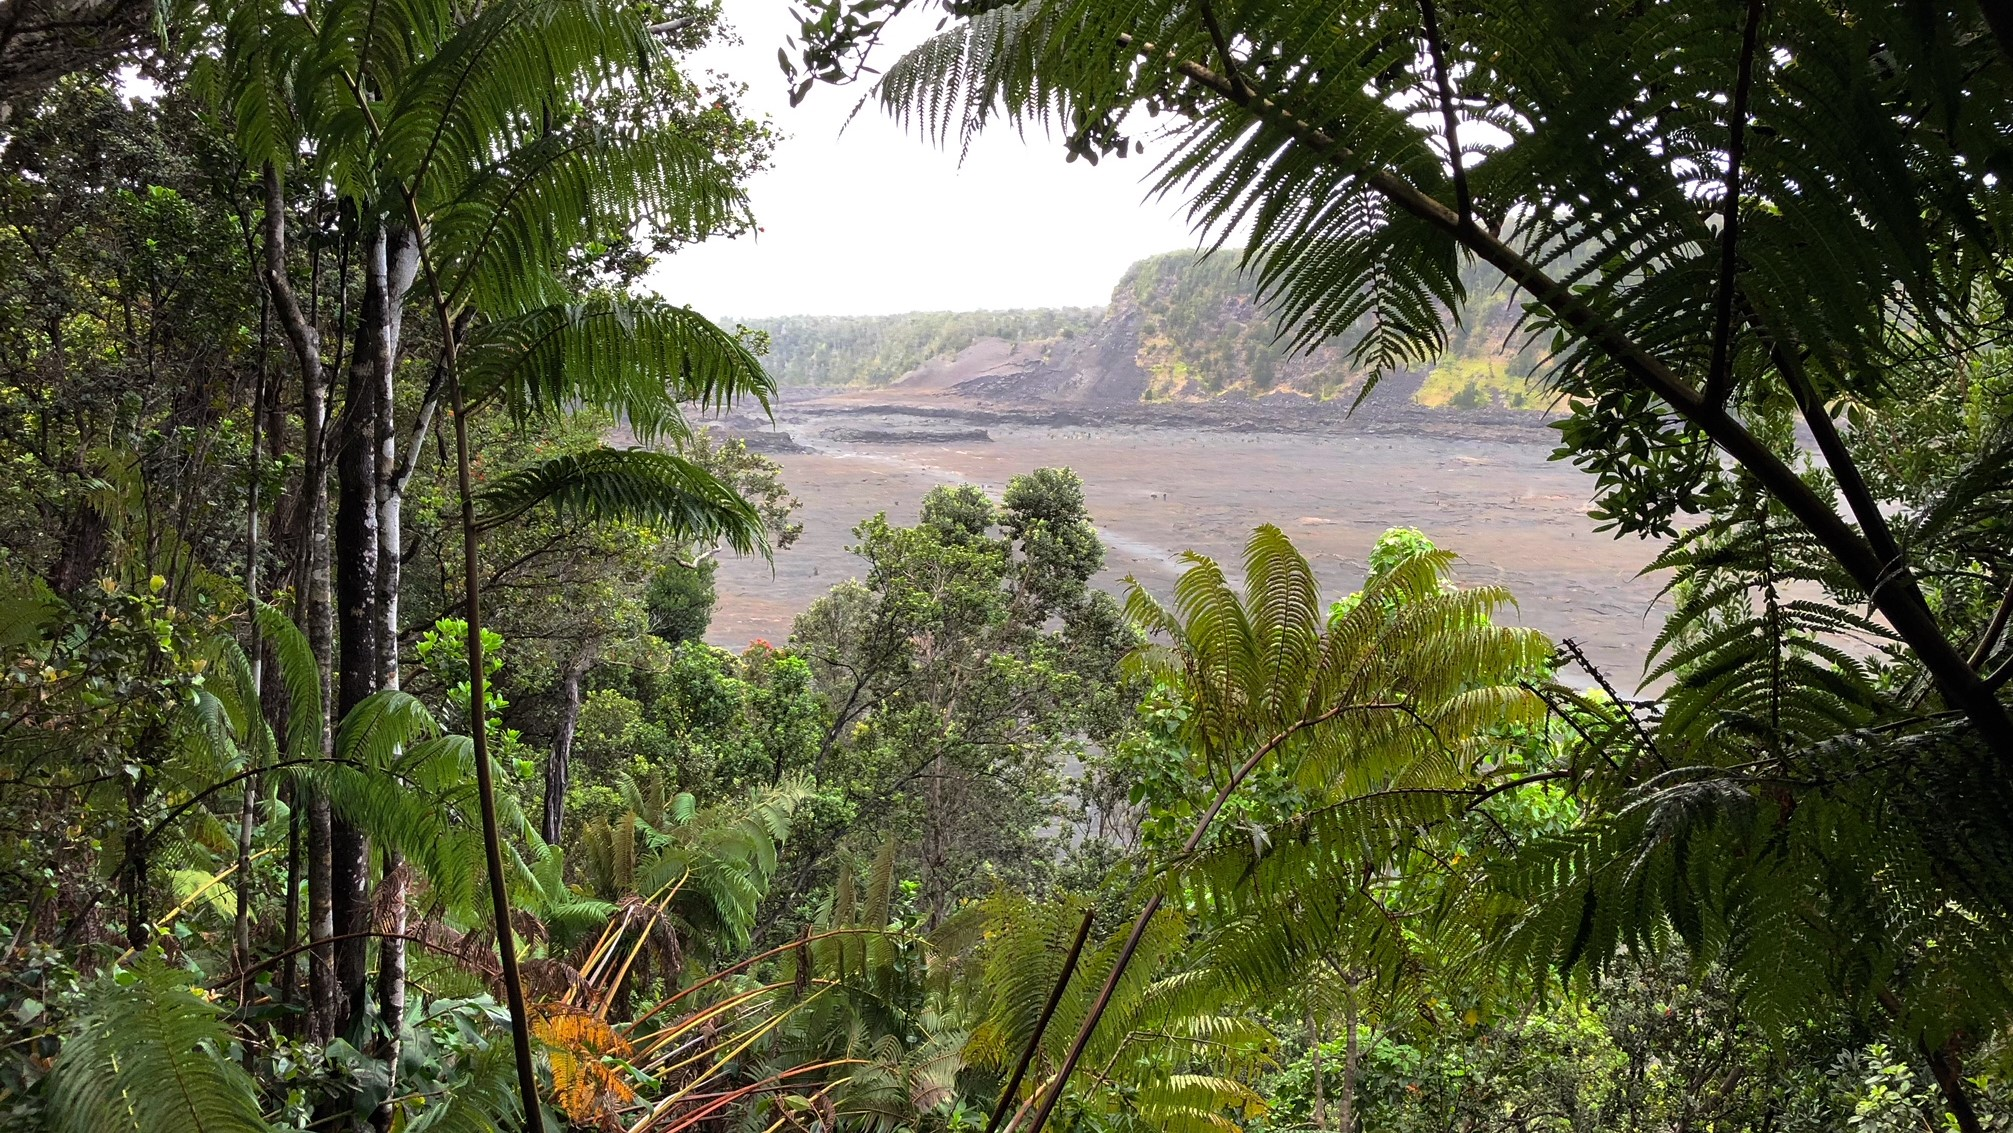 Peeking through the rainforest onto Kīlauea Iki--a small volcano near the larger Kilauea.